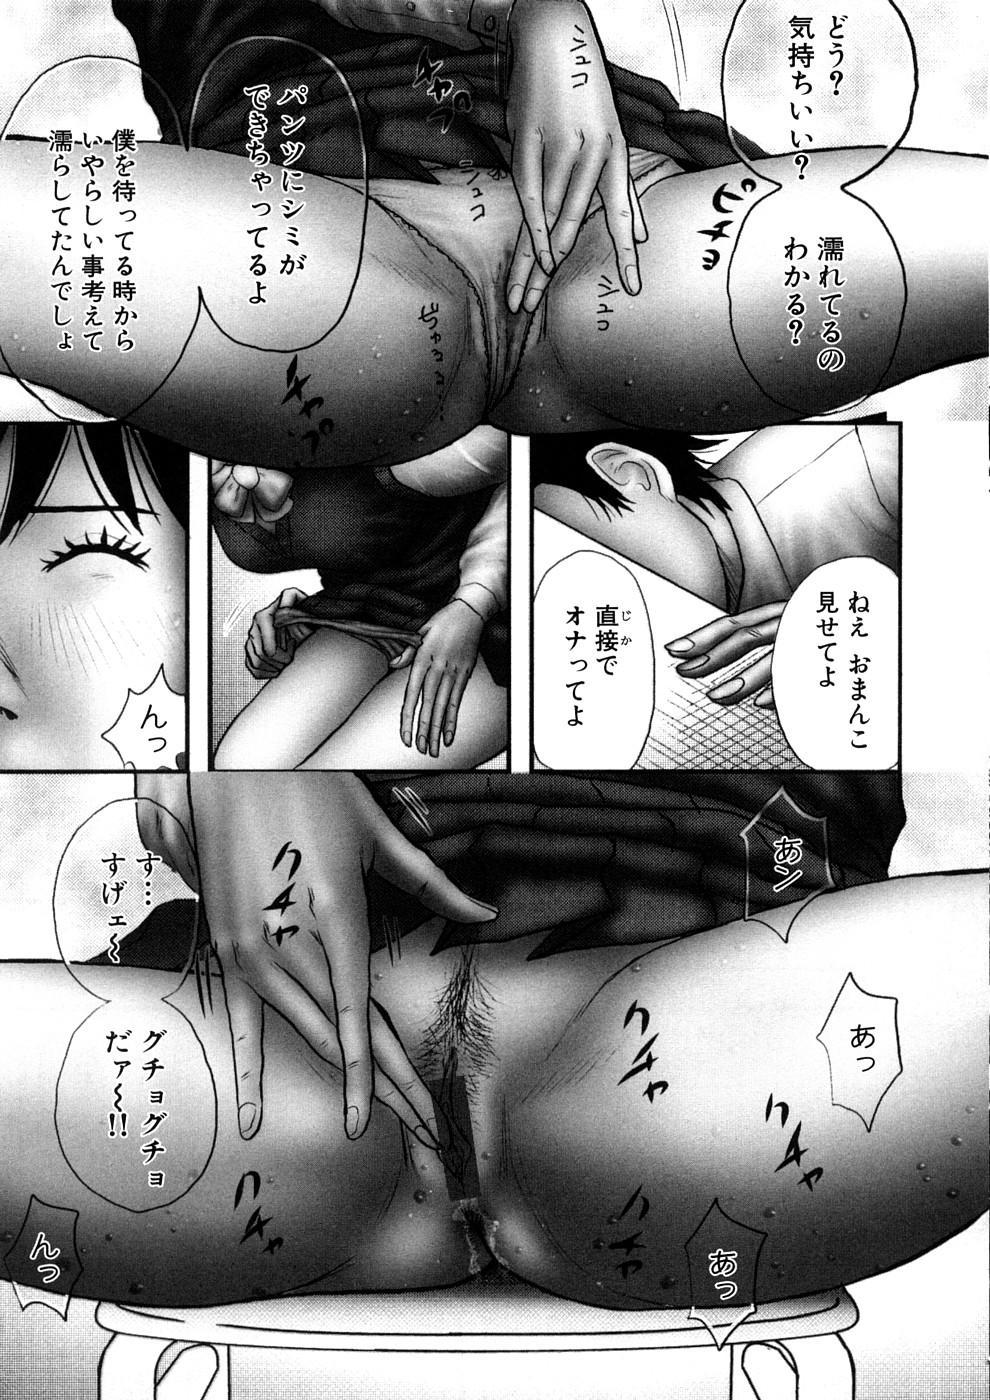 Geki Yaba Anthology Vol. 1 - Naka ni Dashite yo 223